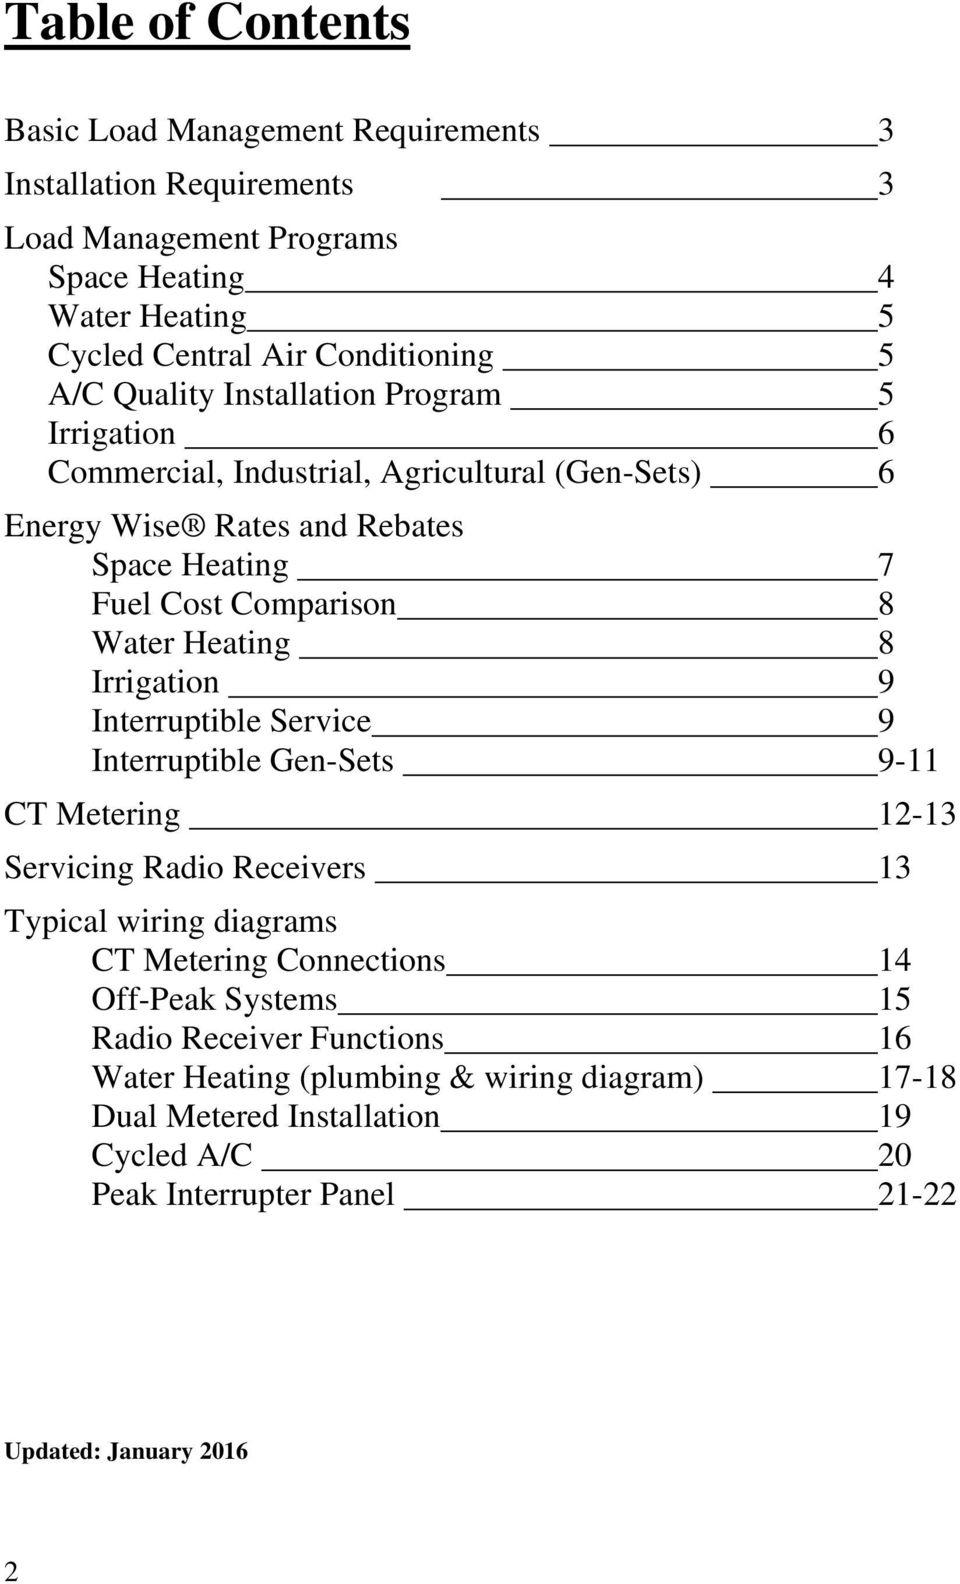 hight resolution of 8 irrigation 9 interruptible service 9 interruptible gen sets 9 11 ct metering 12